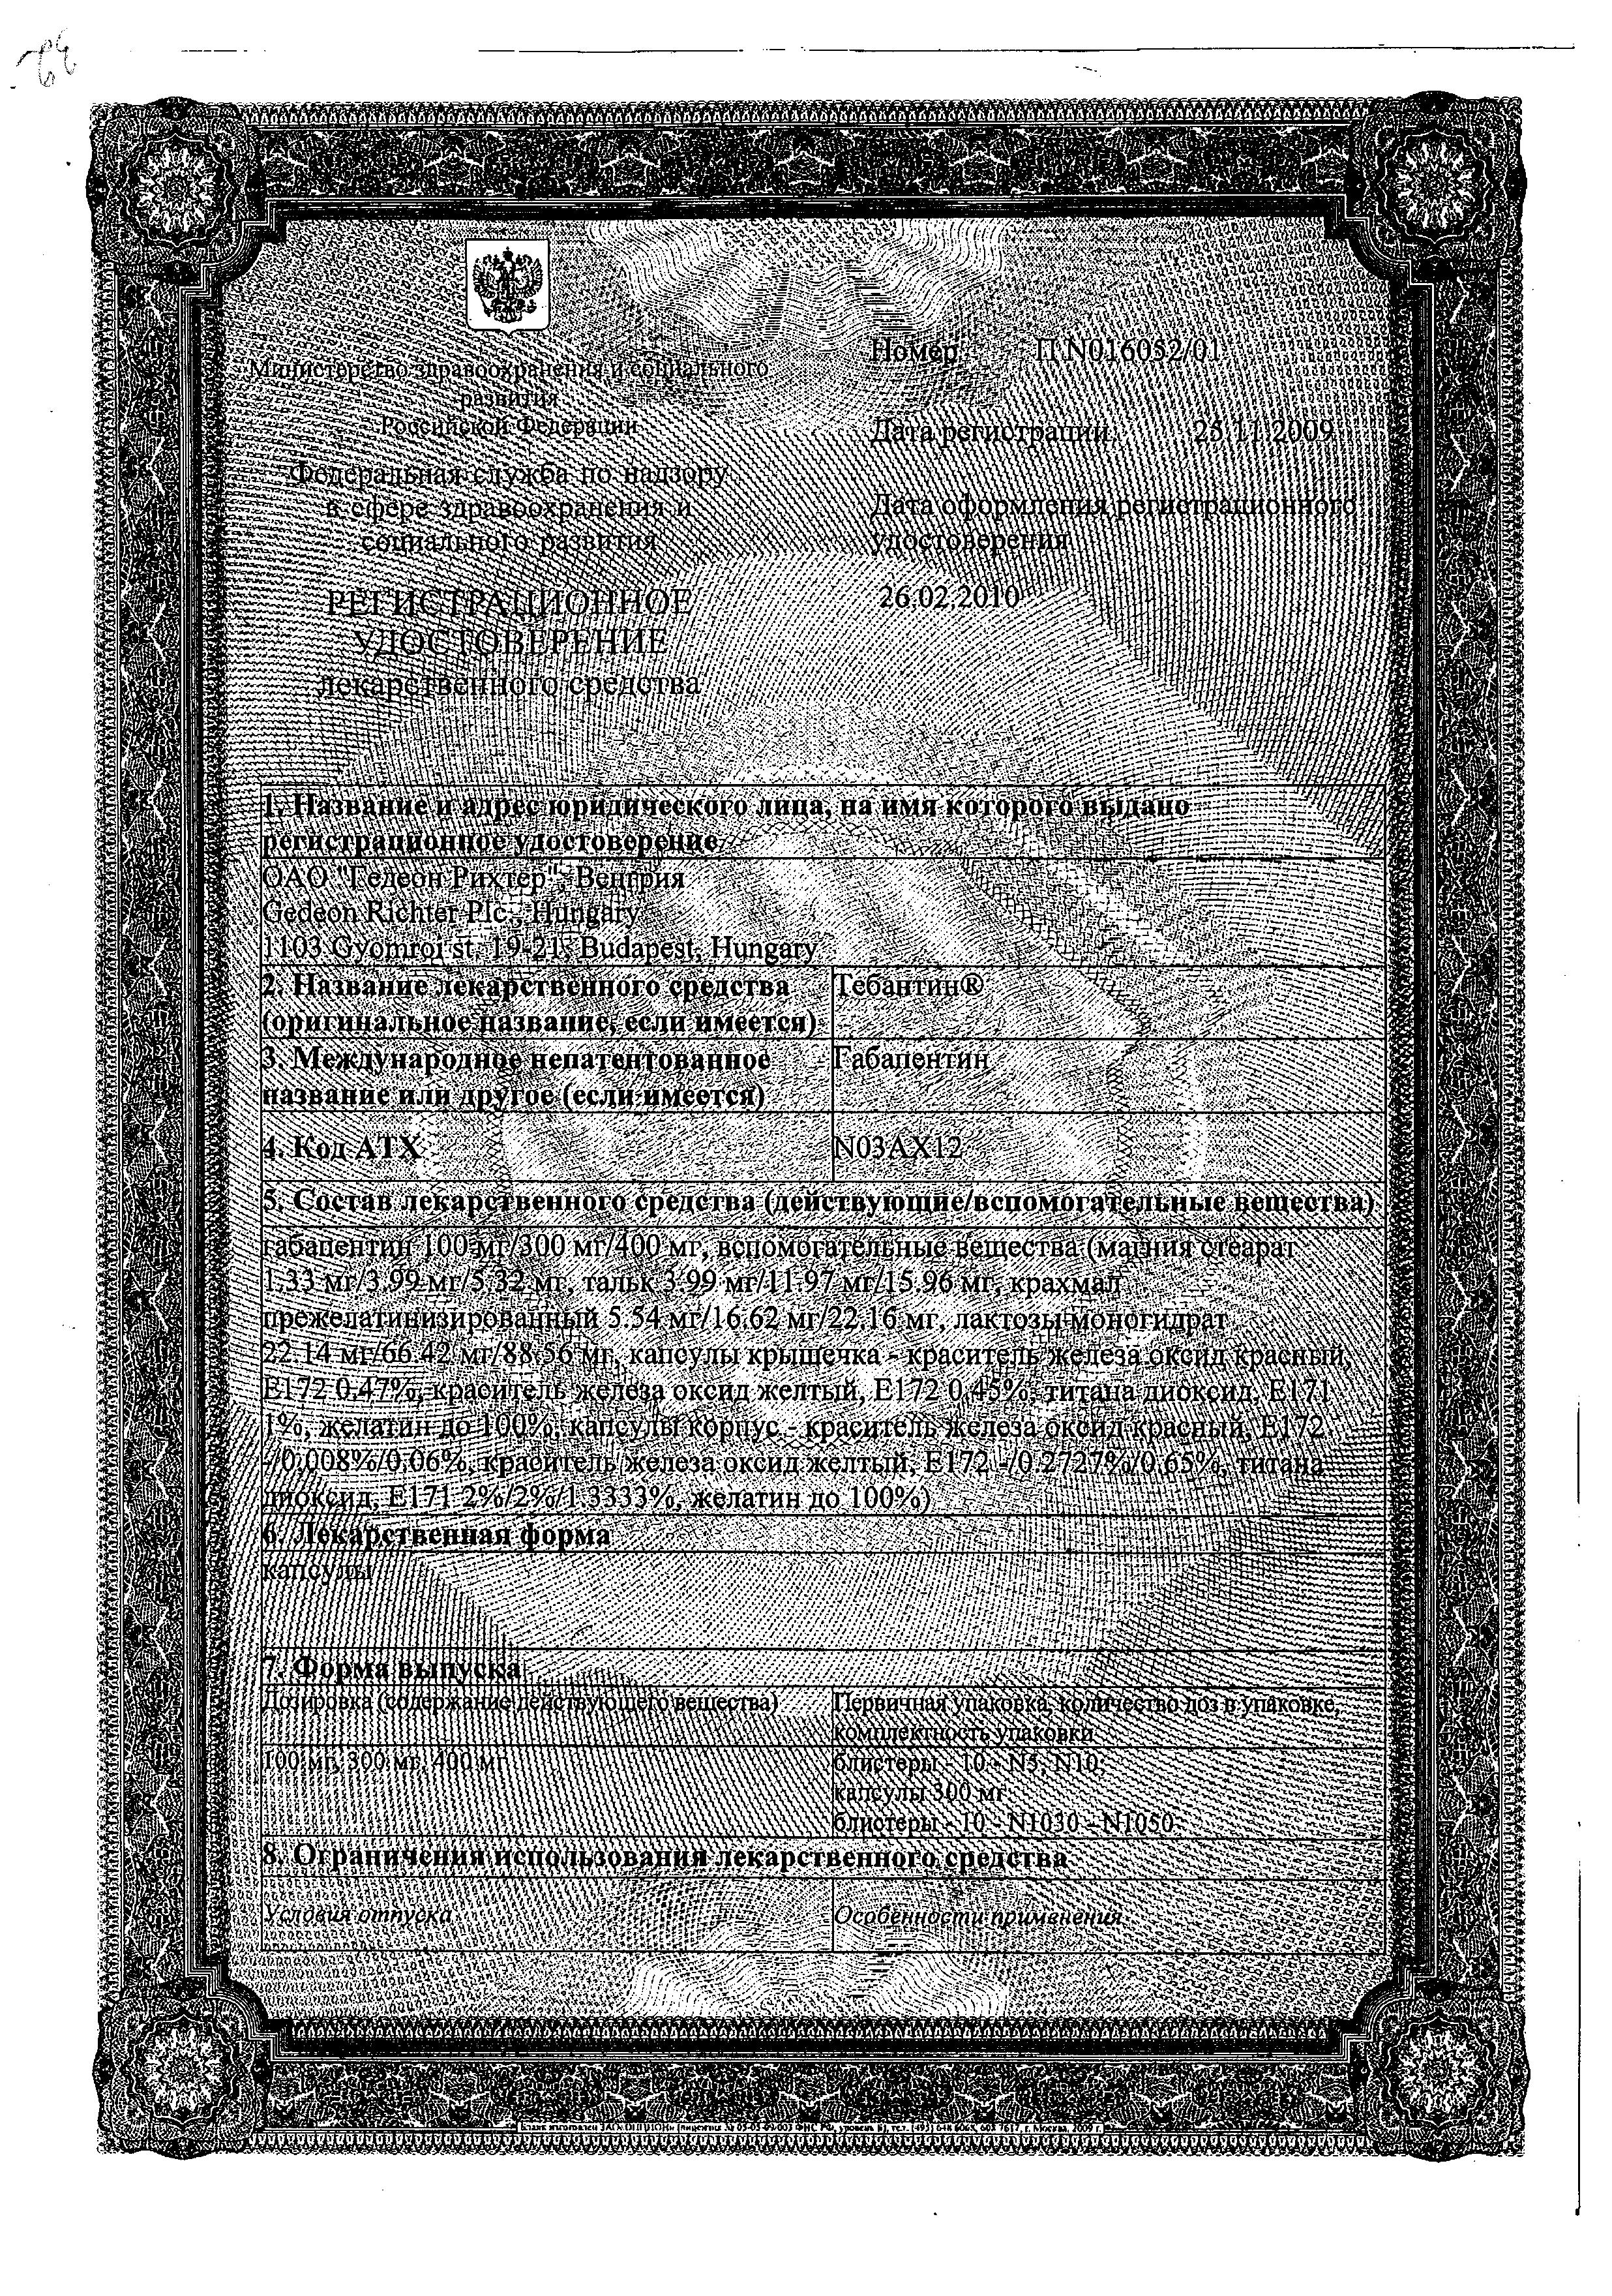 Тебантин сертификат